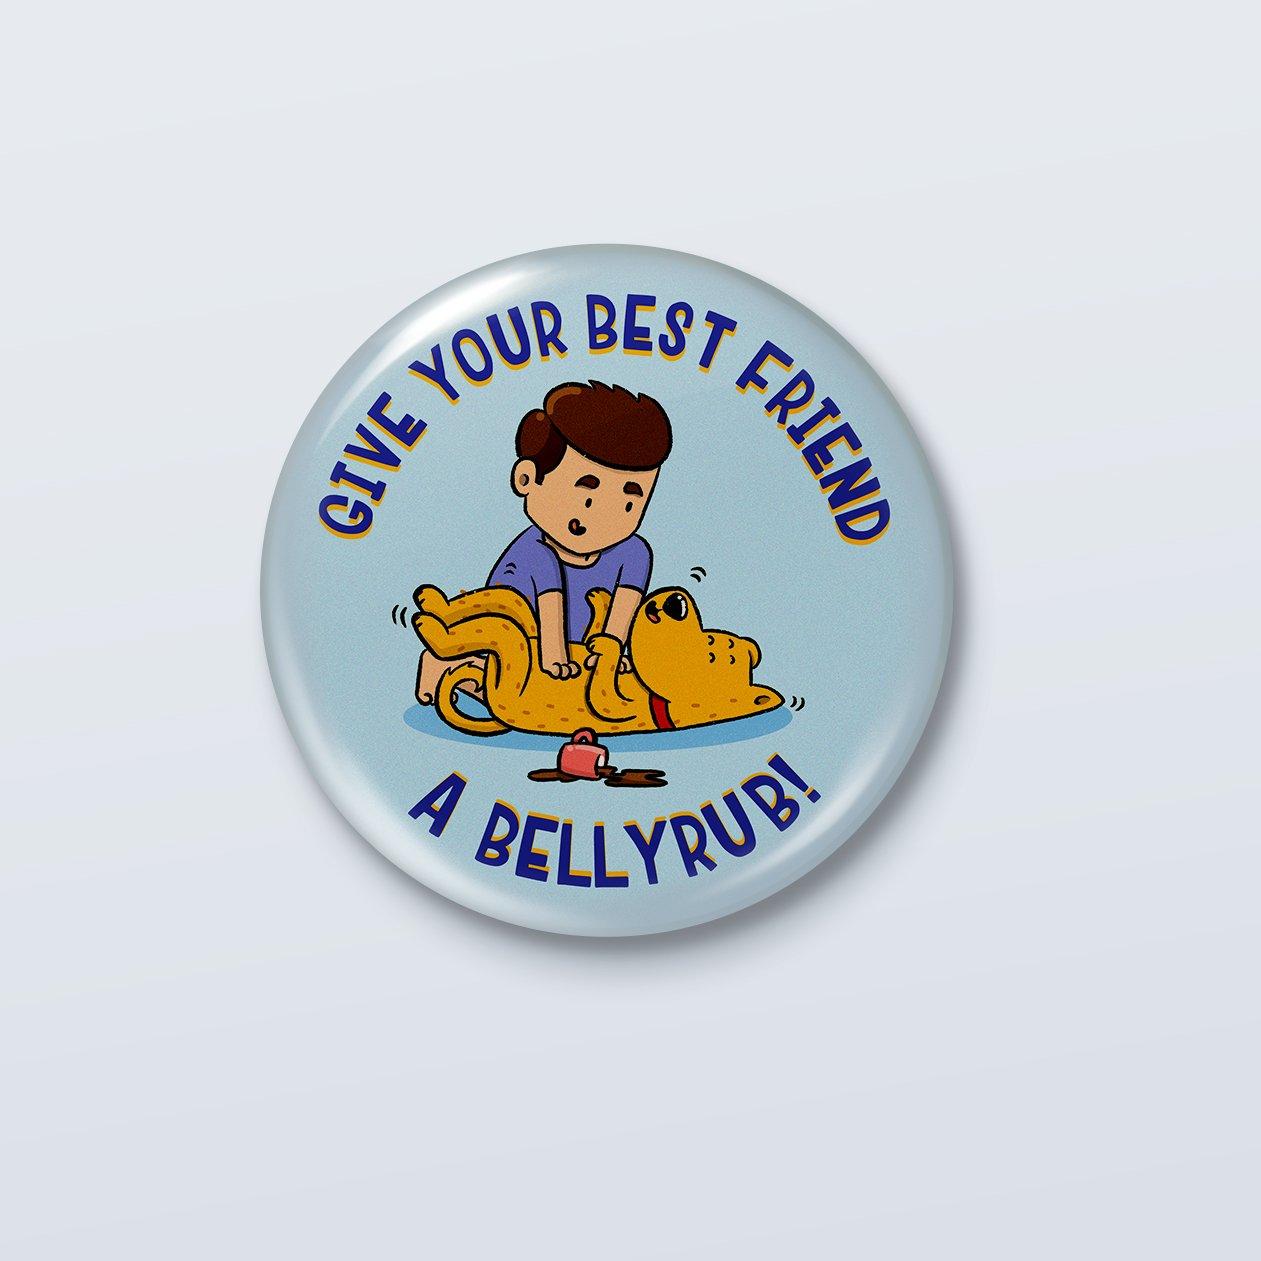 Belly Rub Badge - ₹49